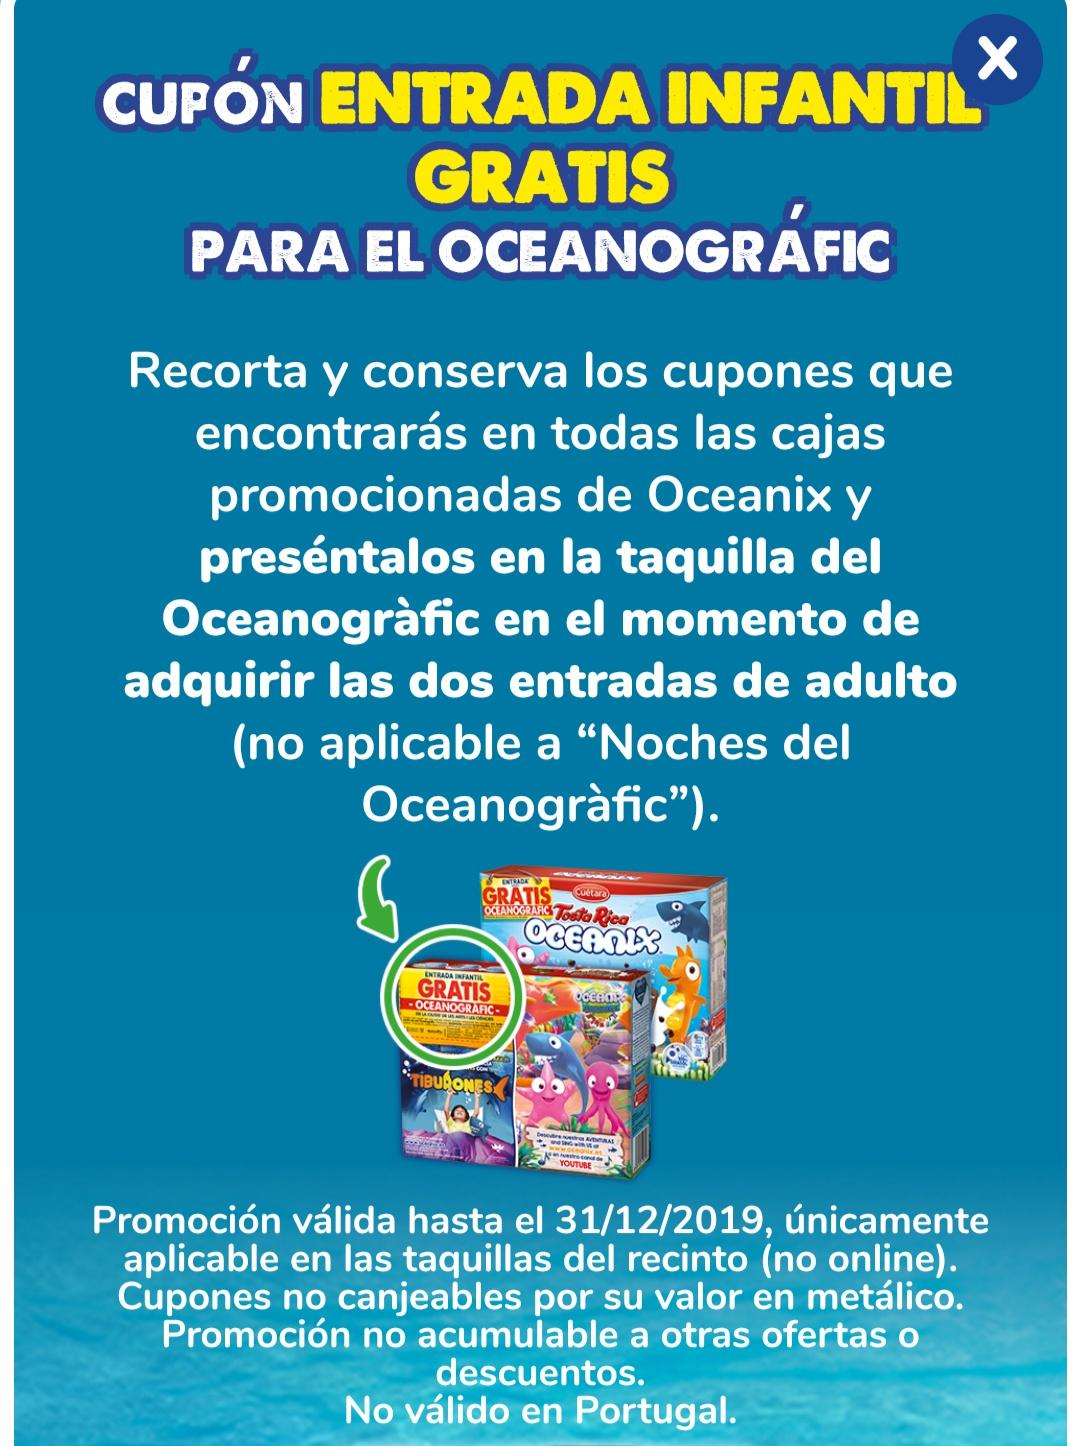 Entrada infantil gratis al oceanográfic de Valencia con tostarrica